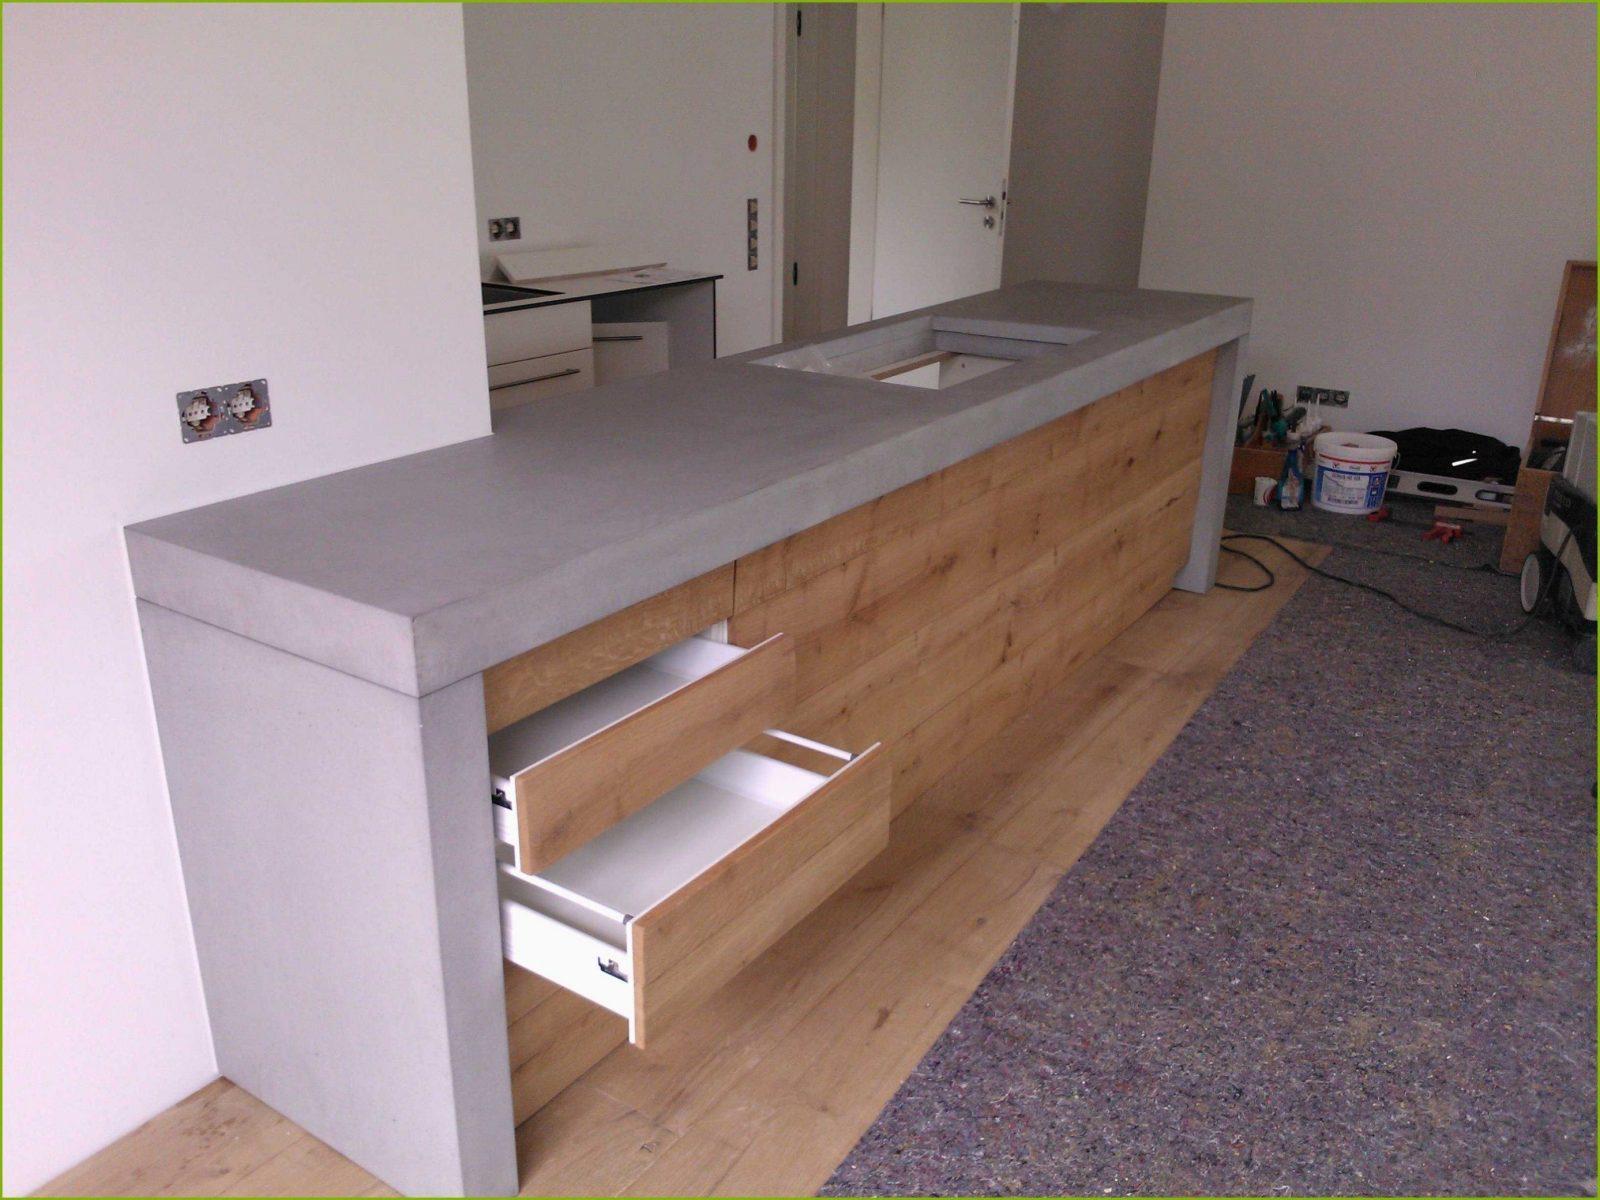 arbeitsplatte aus beton 27 best k chenarbeitsplatte selber machen von arbeitsplatte aus beton. Black Bedroom Furniture Sets. Home Design Ideas